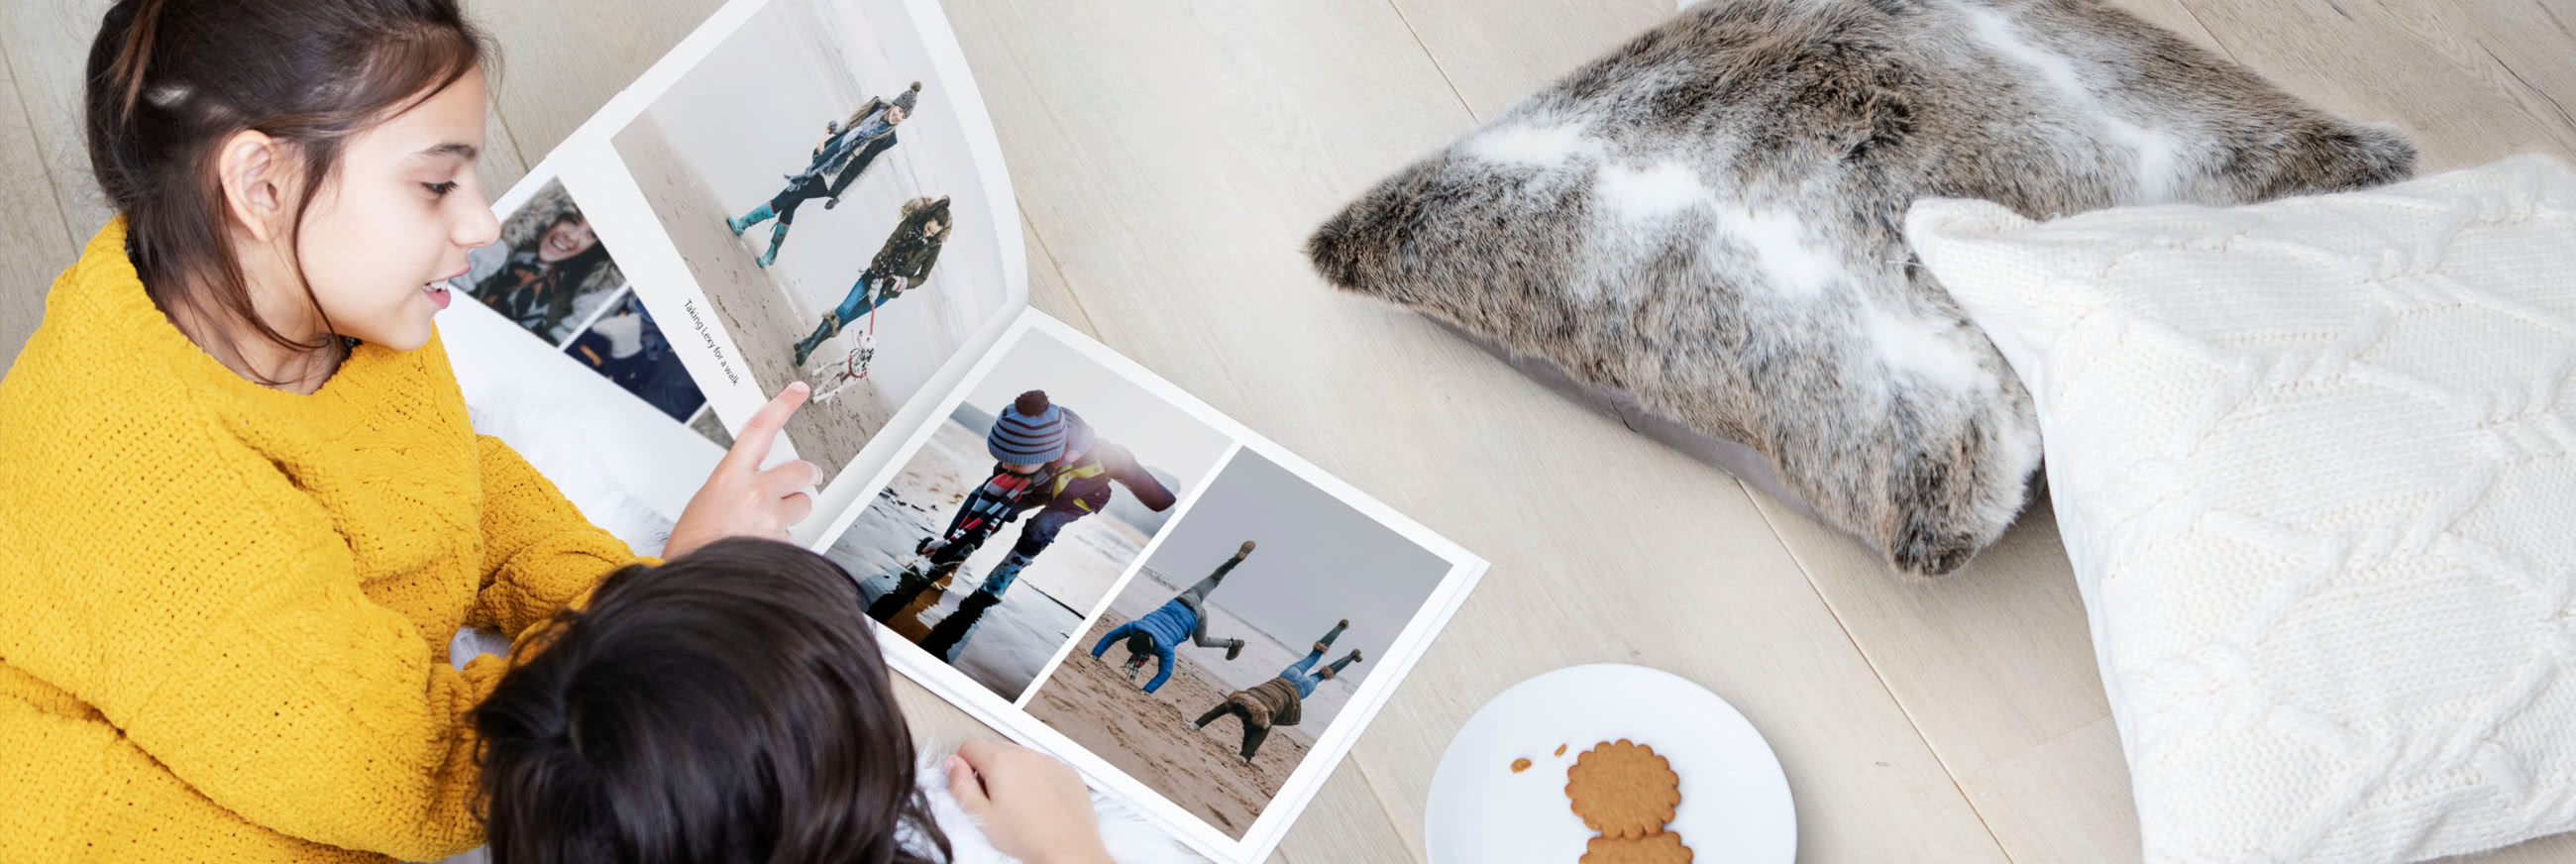 Premium-Fotobuch: Layflat A4 und A3